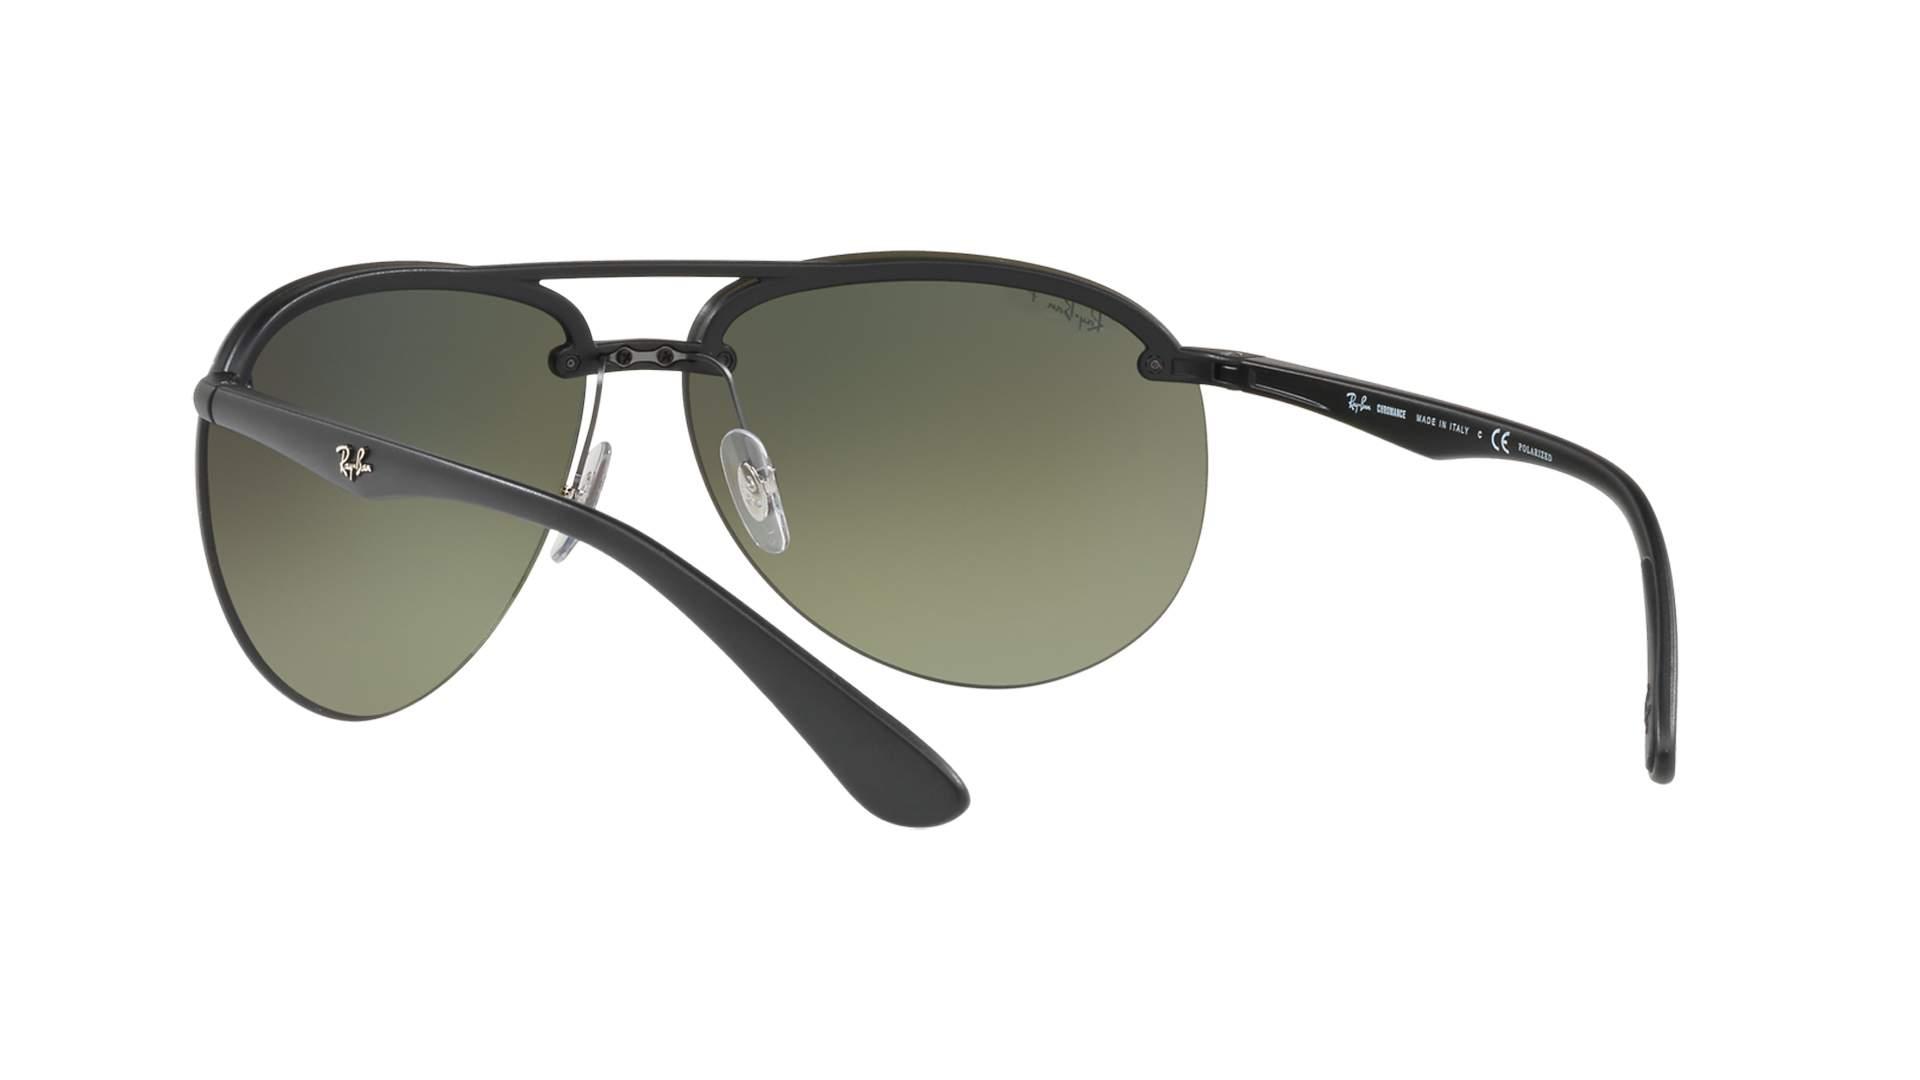 914c00688f8 Sunglasses Ray-Ban RB4293CH 601S 5J 65-13 Black Matte Chromance Large  Polarized Mirror